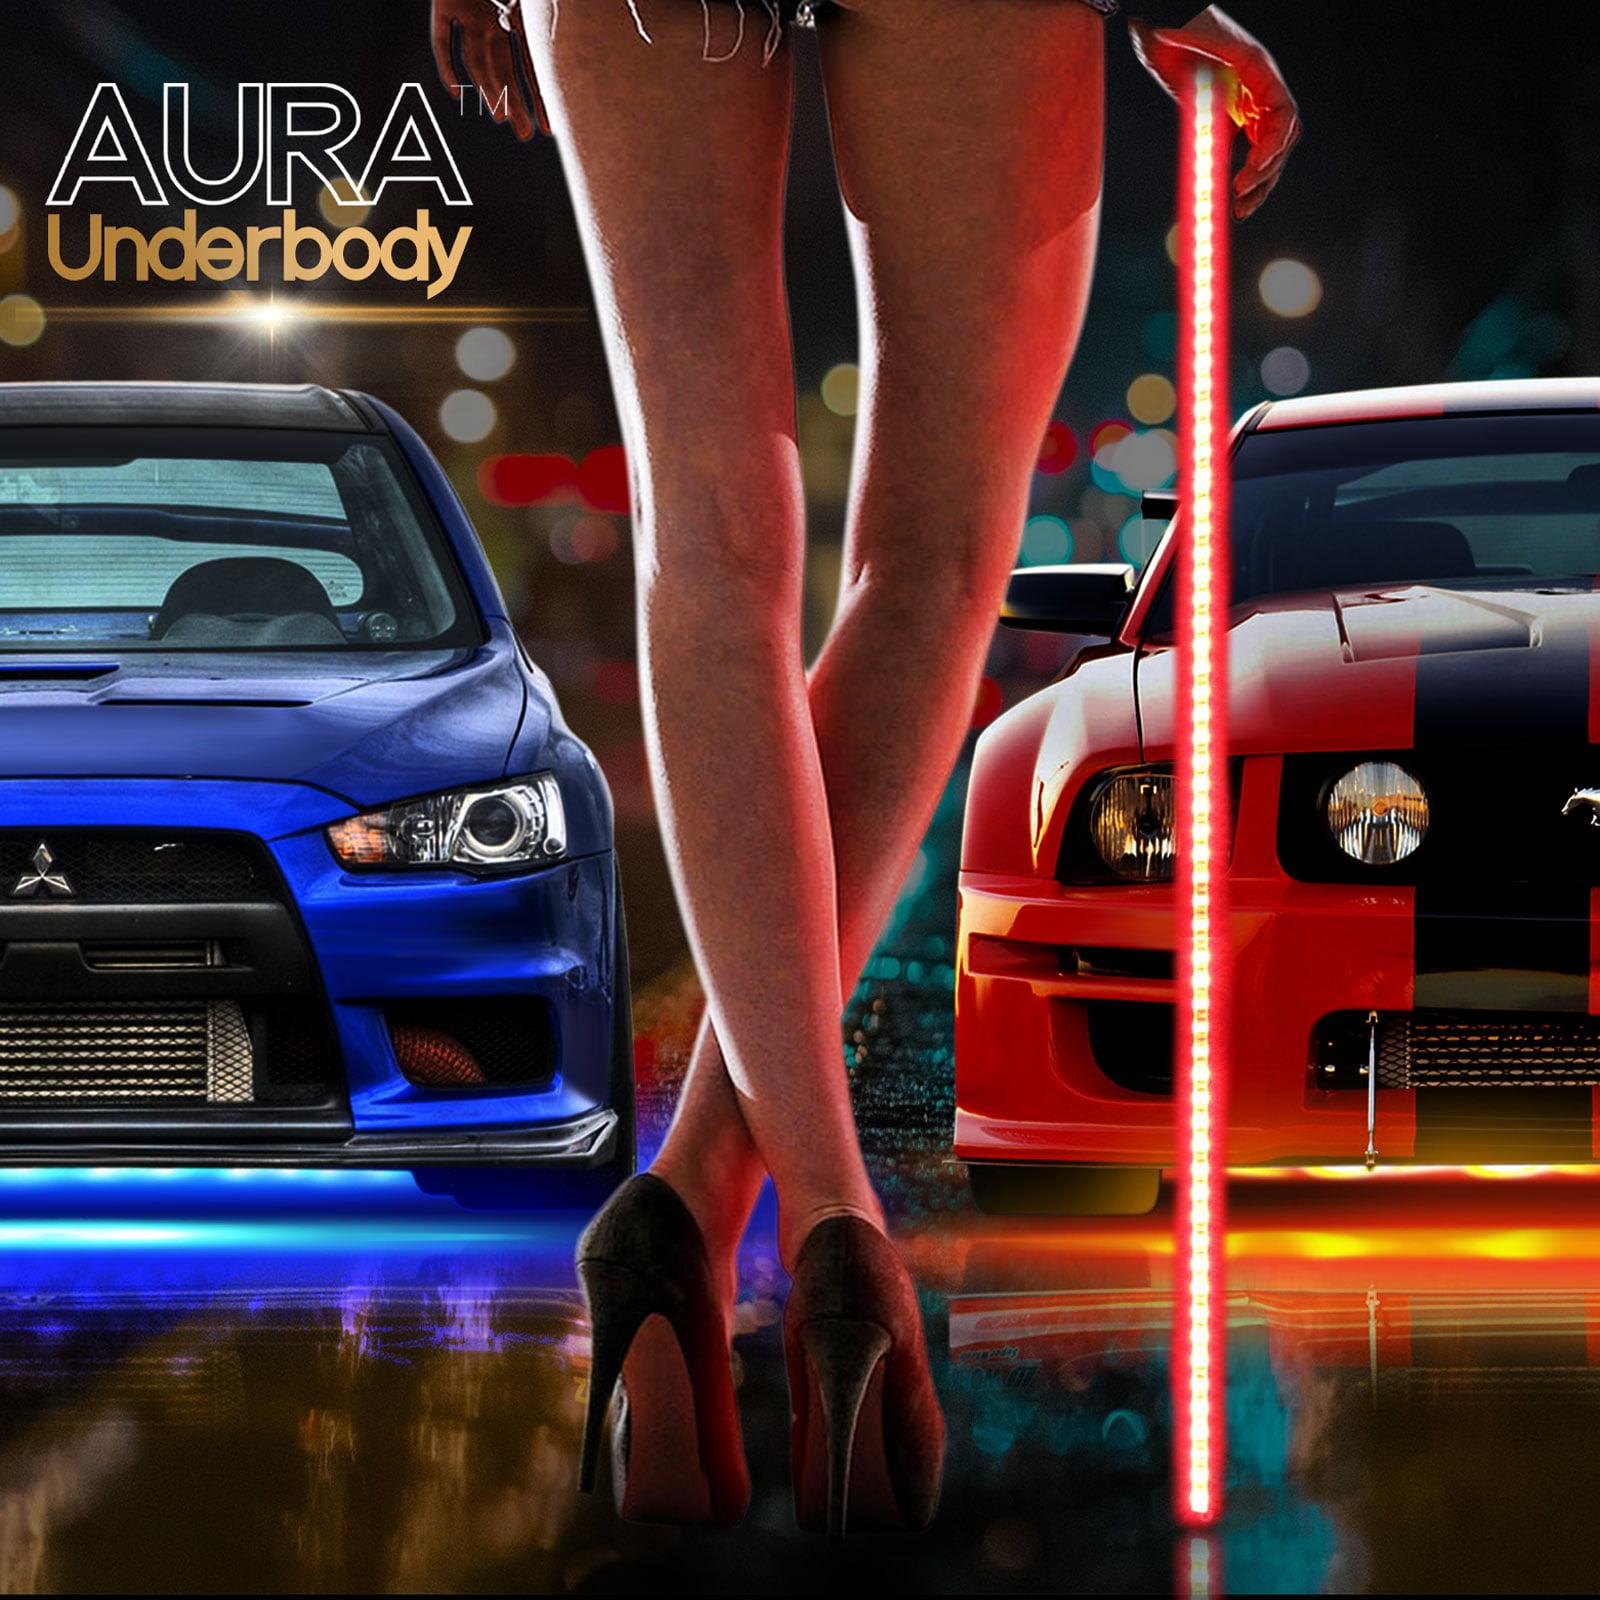 AURA® 4pc LED Underbody Lighting Kit - Full Color Spectrum - Smart-Color™ Strips - Aluminum Build - E-Z Remotes